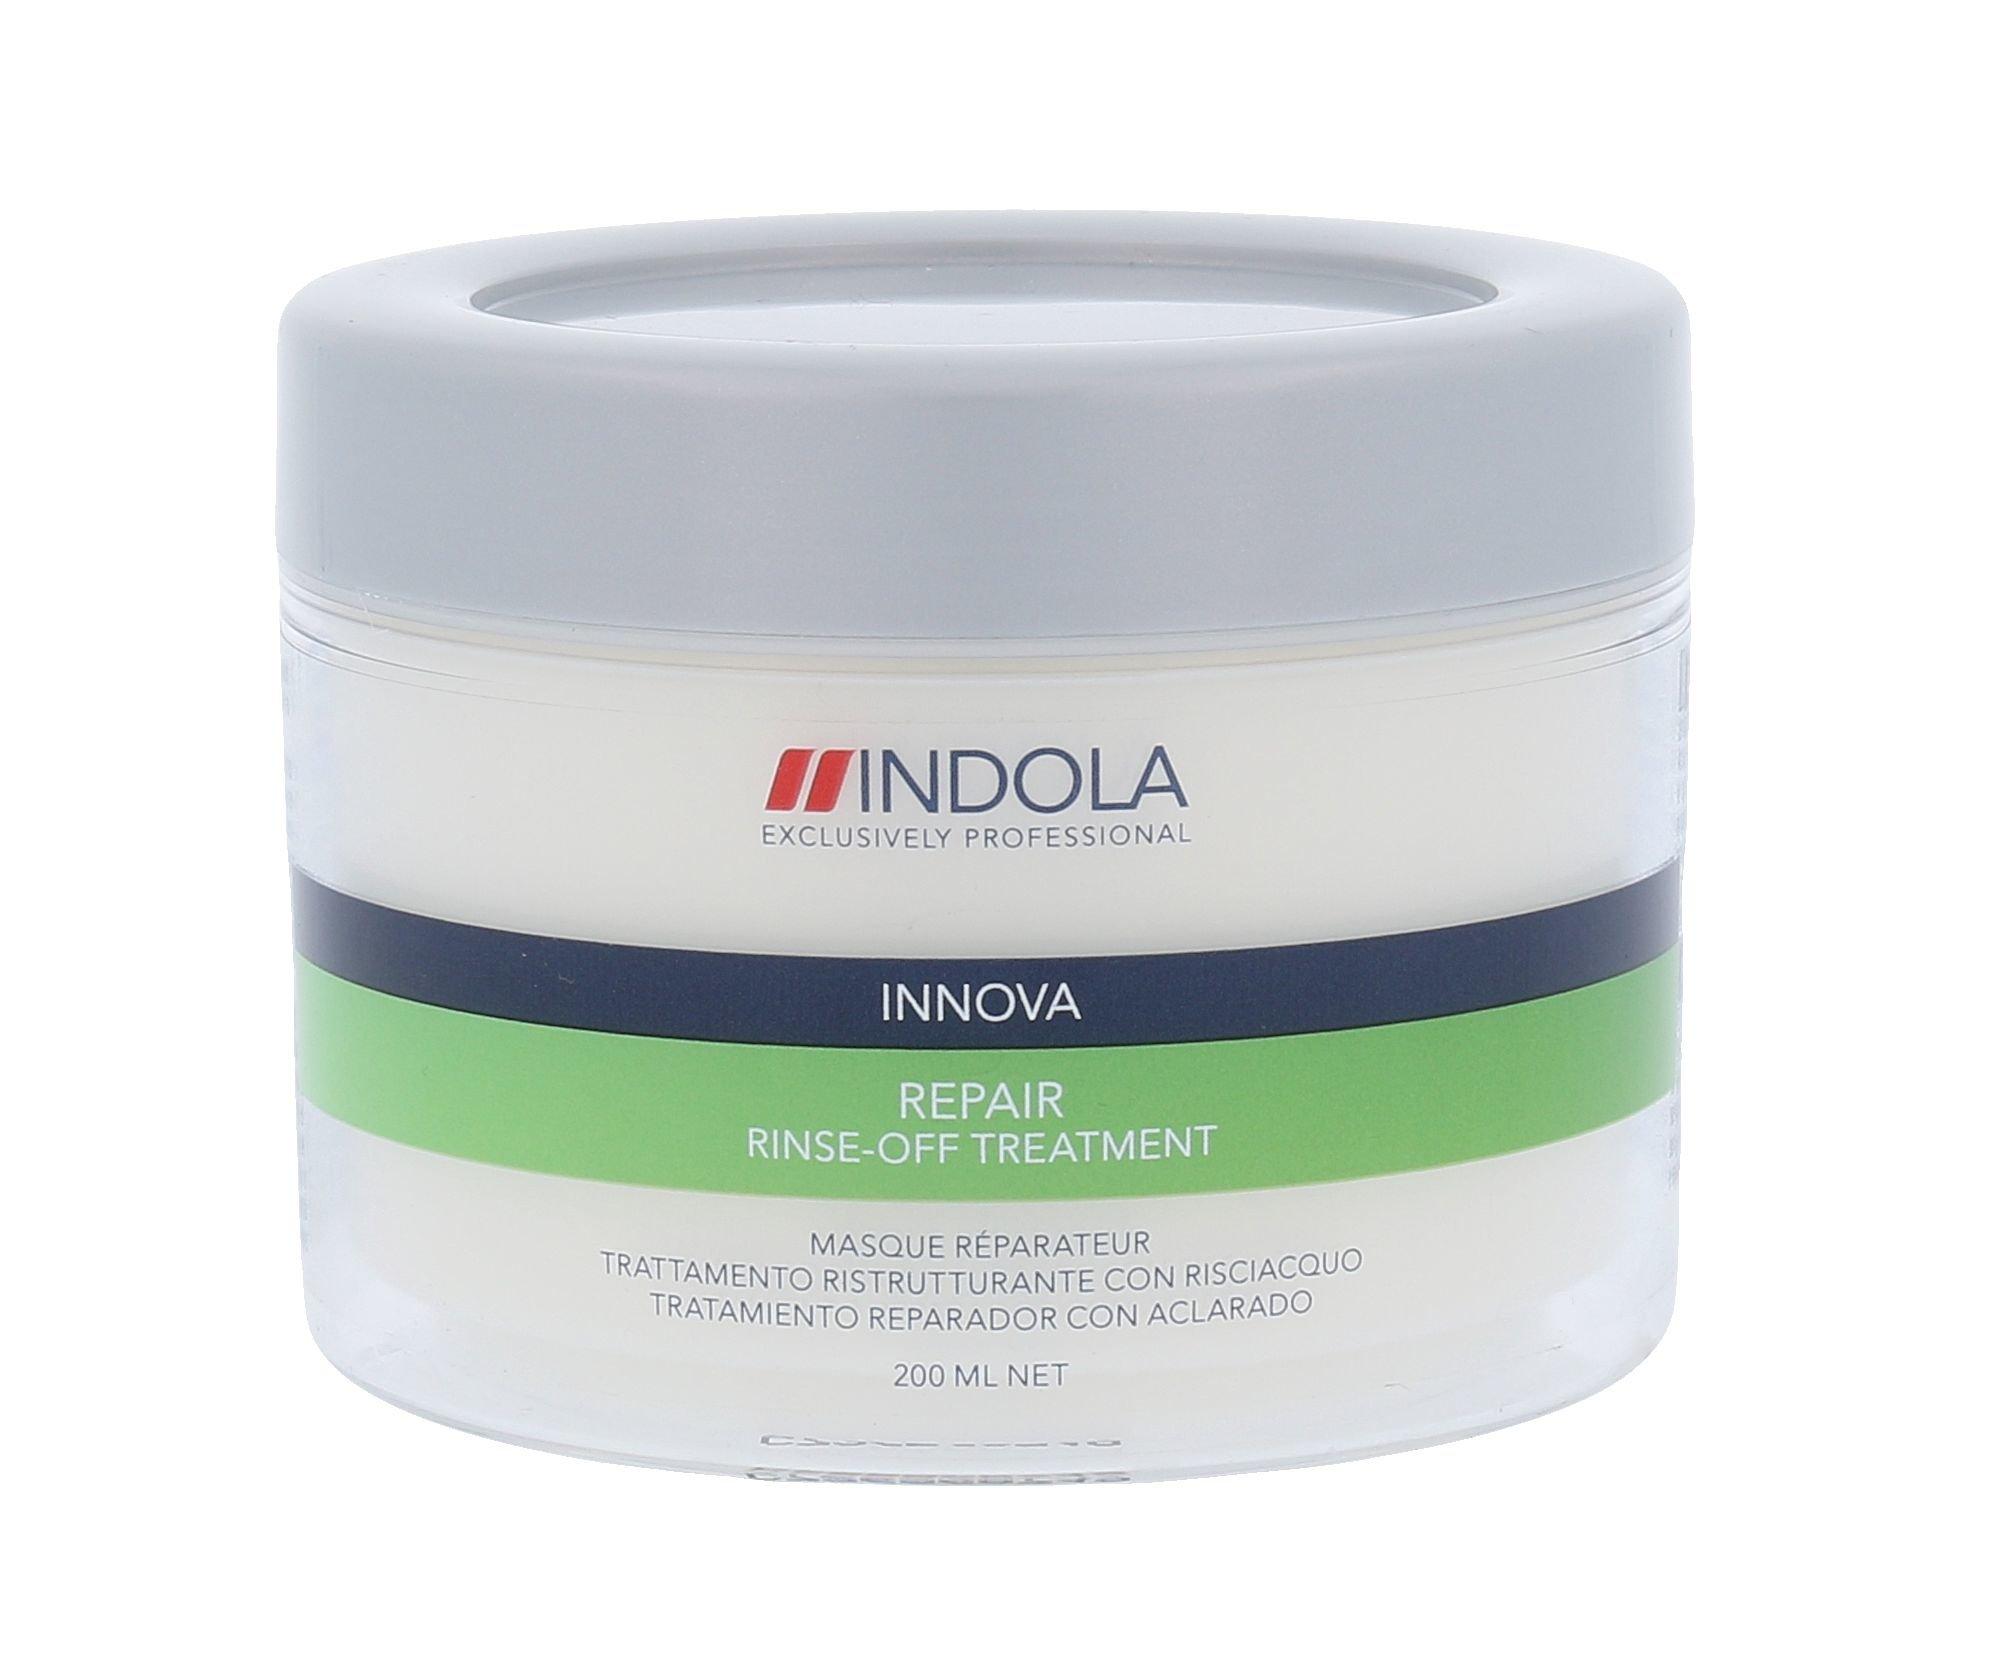 Indola Innova Repair Cosmetic 200ml  Rinse-Off Treatment